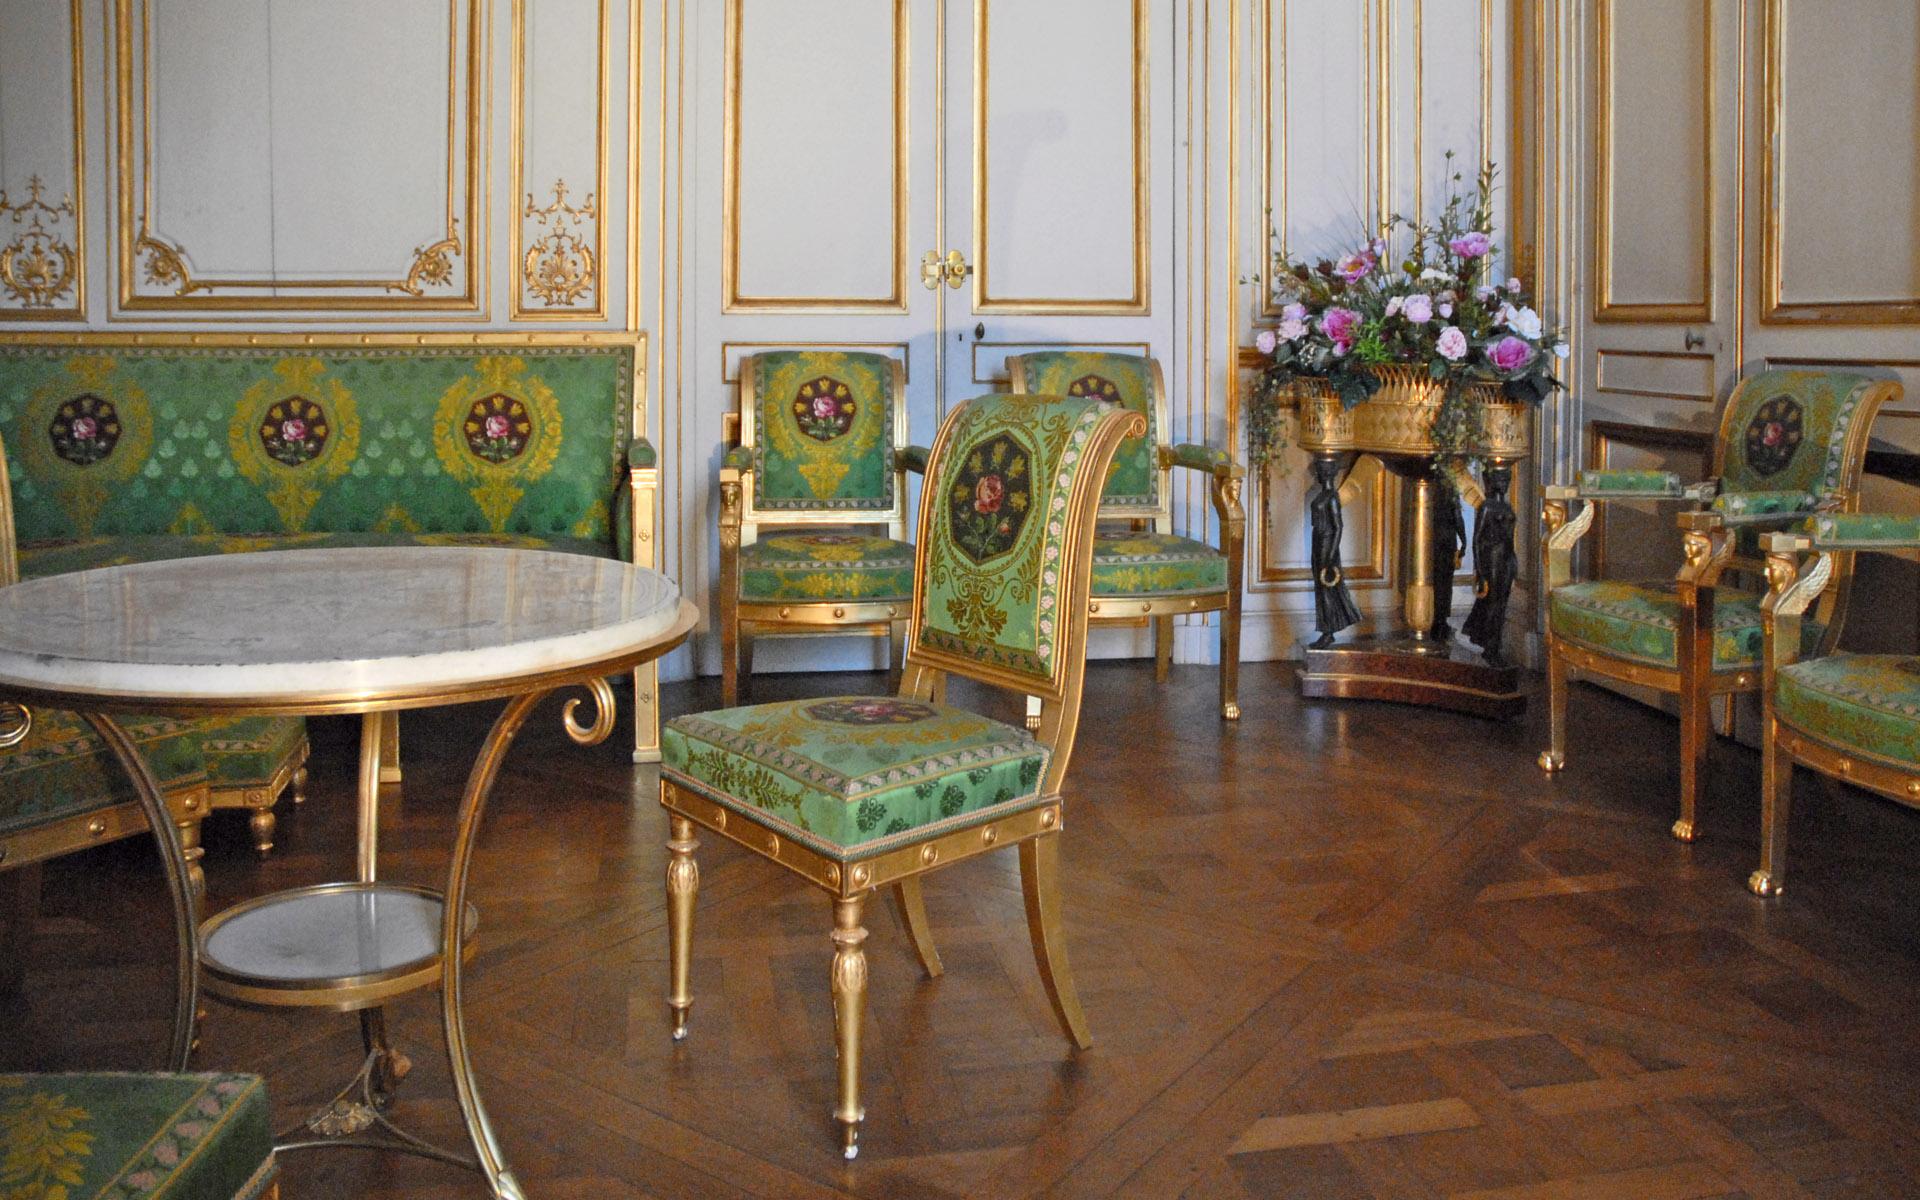 file le salon blanc ch teau de fontainebleau jpg wikimedia commons. Black Bedroom Furniture Sets. Home Design Ideas